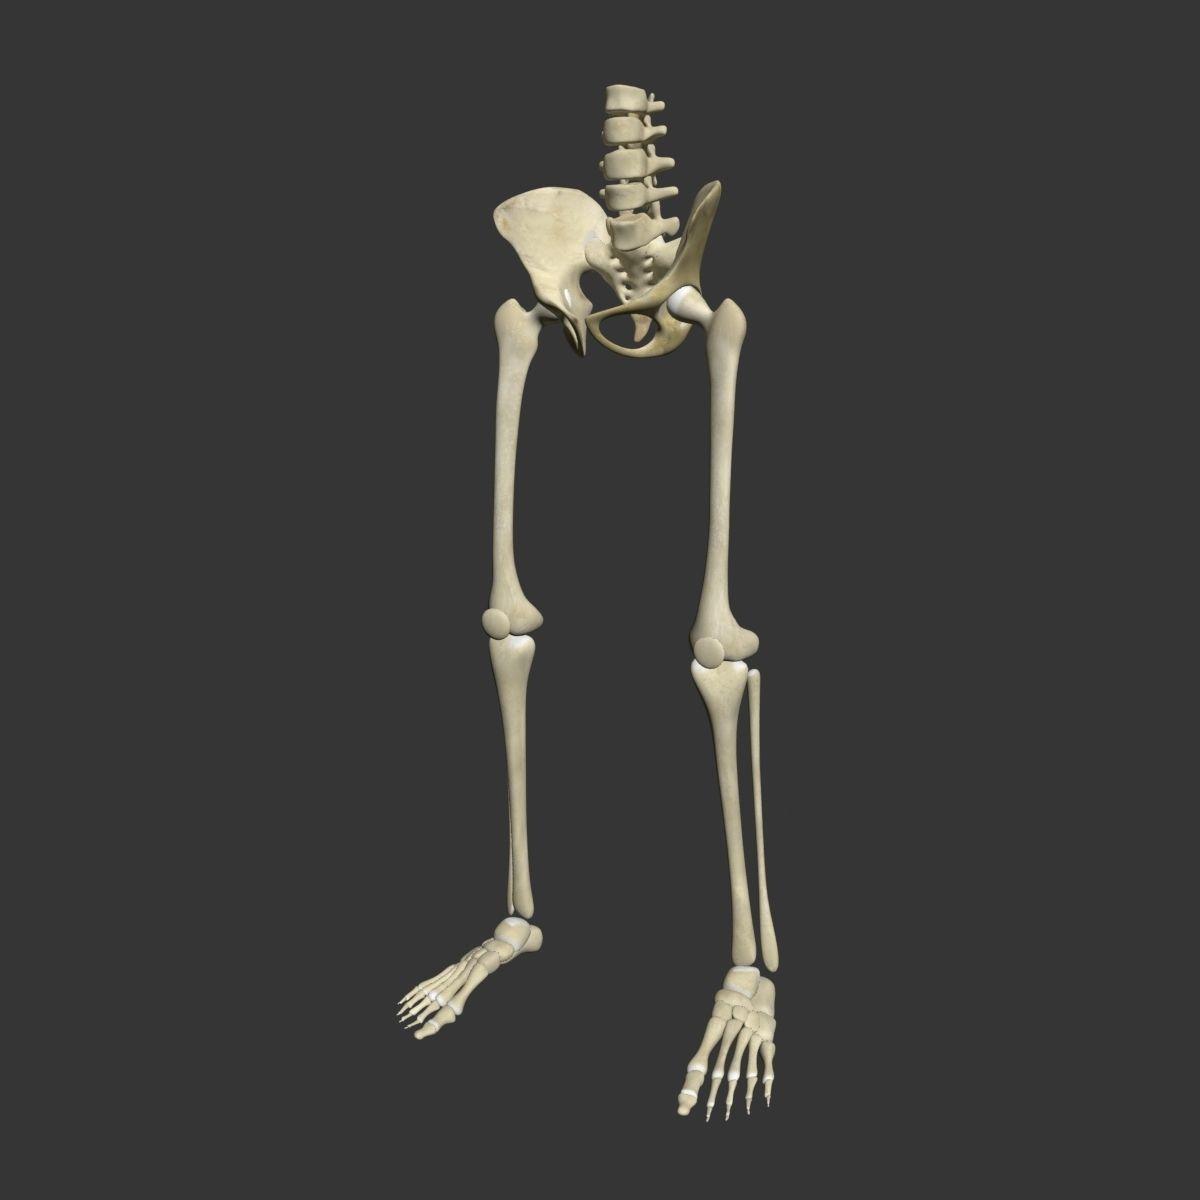 Human Skeleton Legs 3d Model Cgtrader